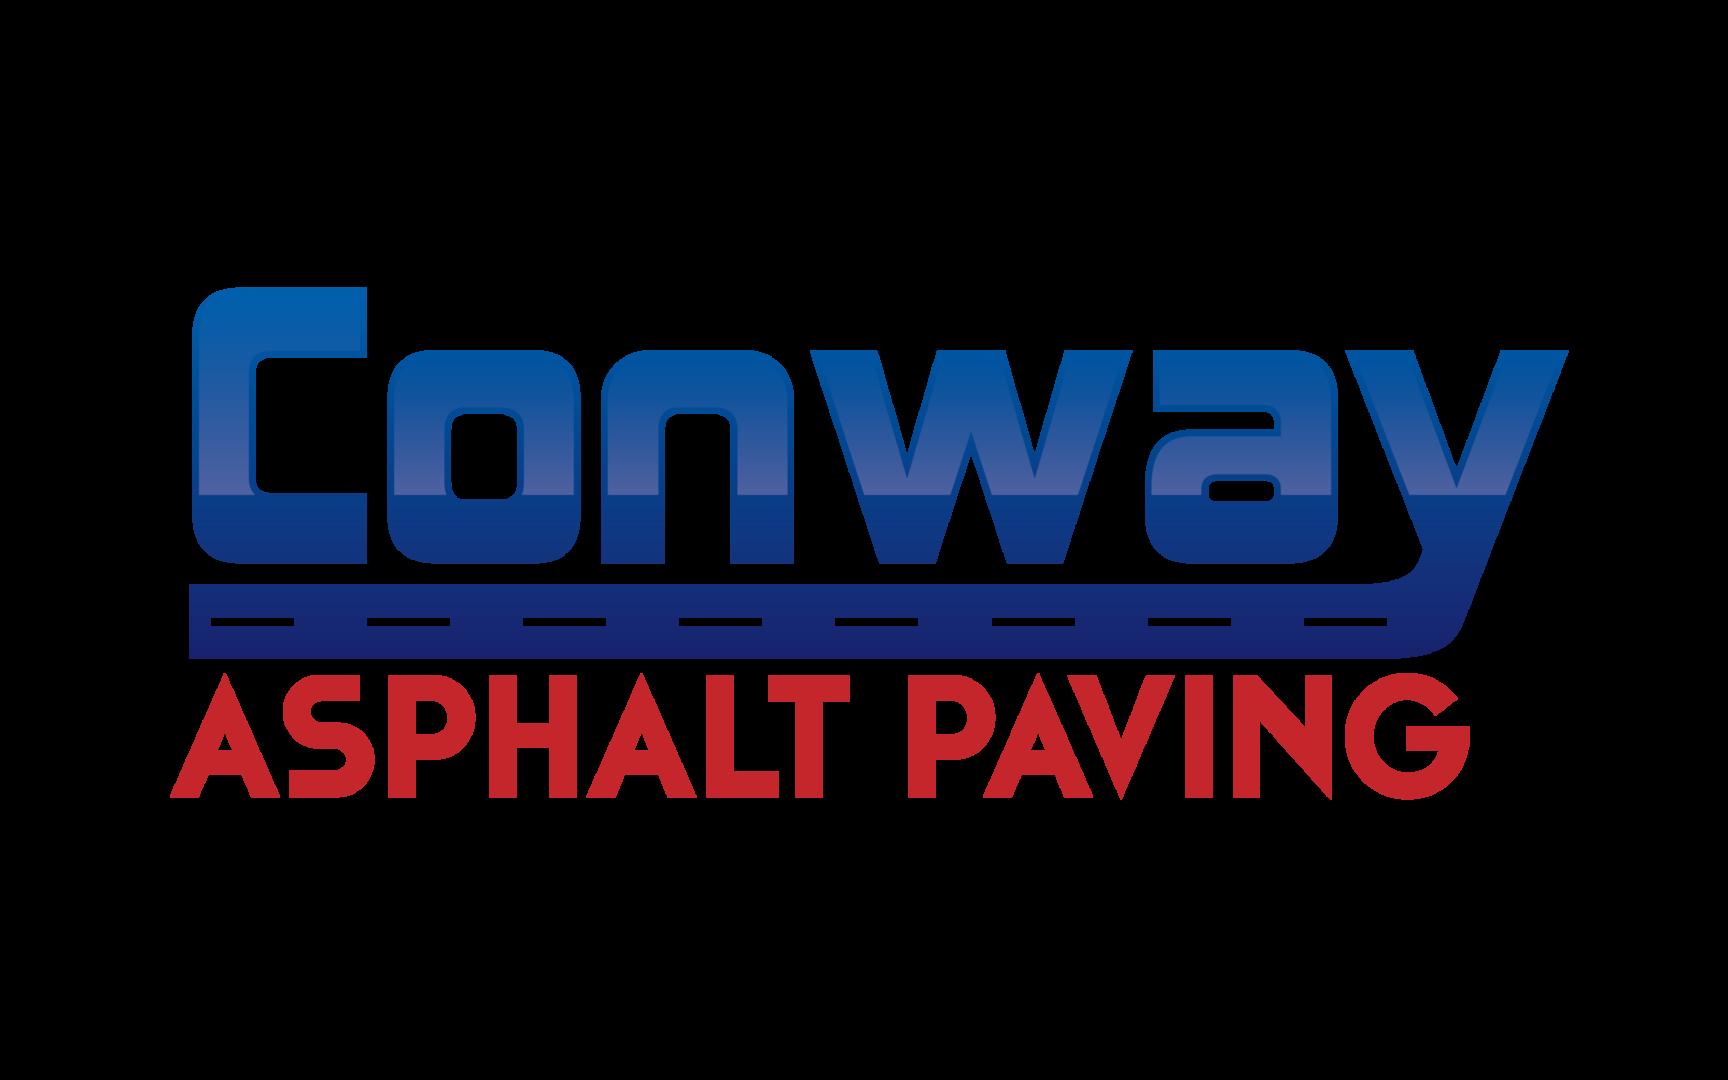 Conway Asphalt Paving_29102020 final-01